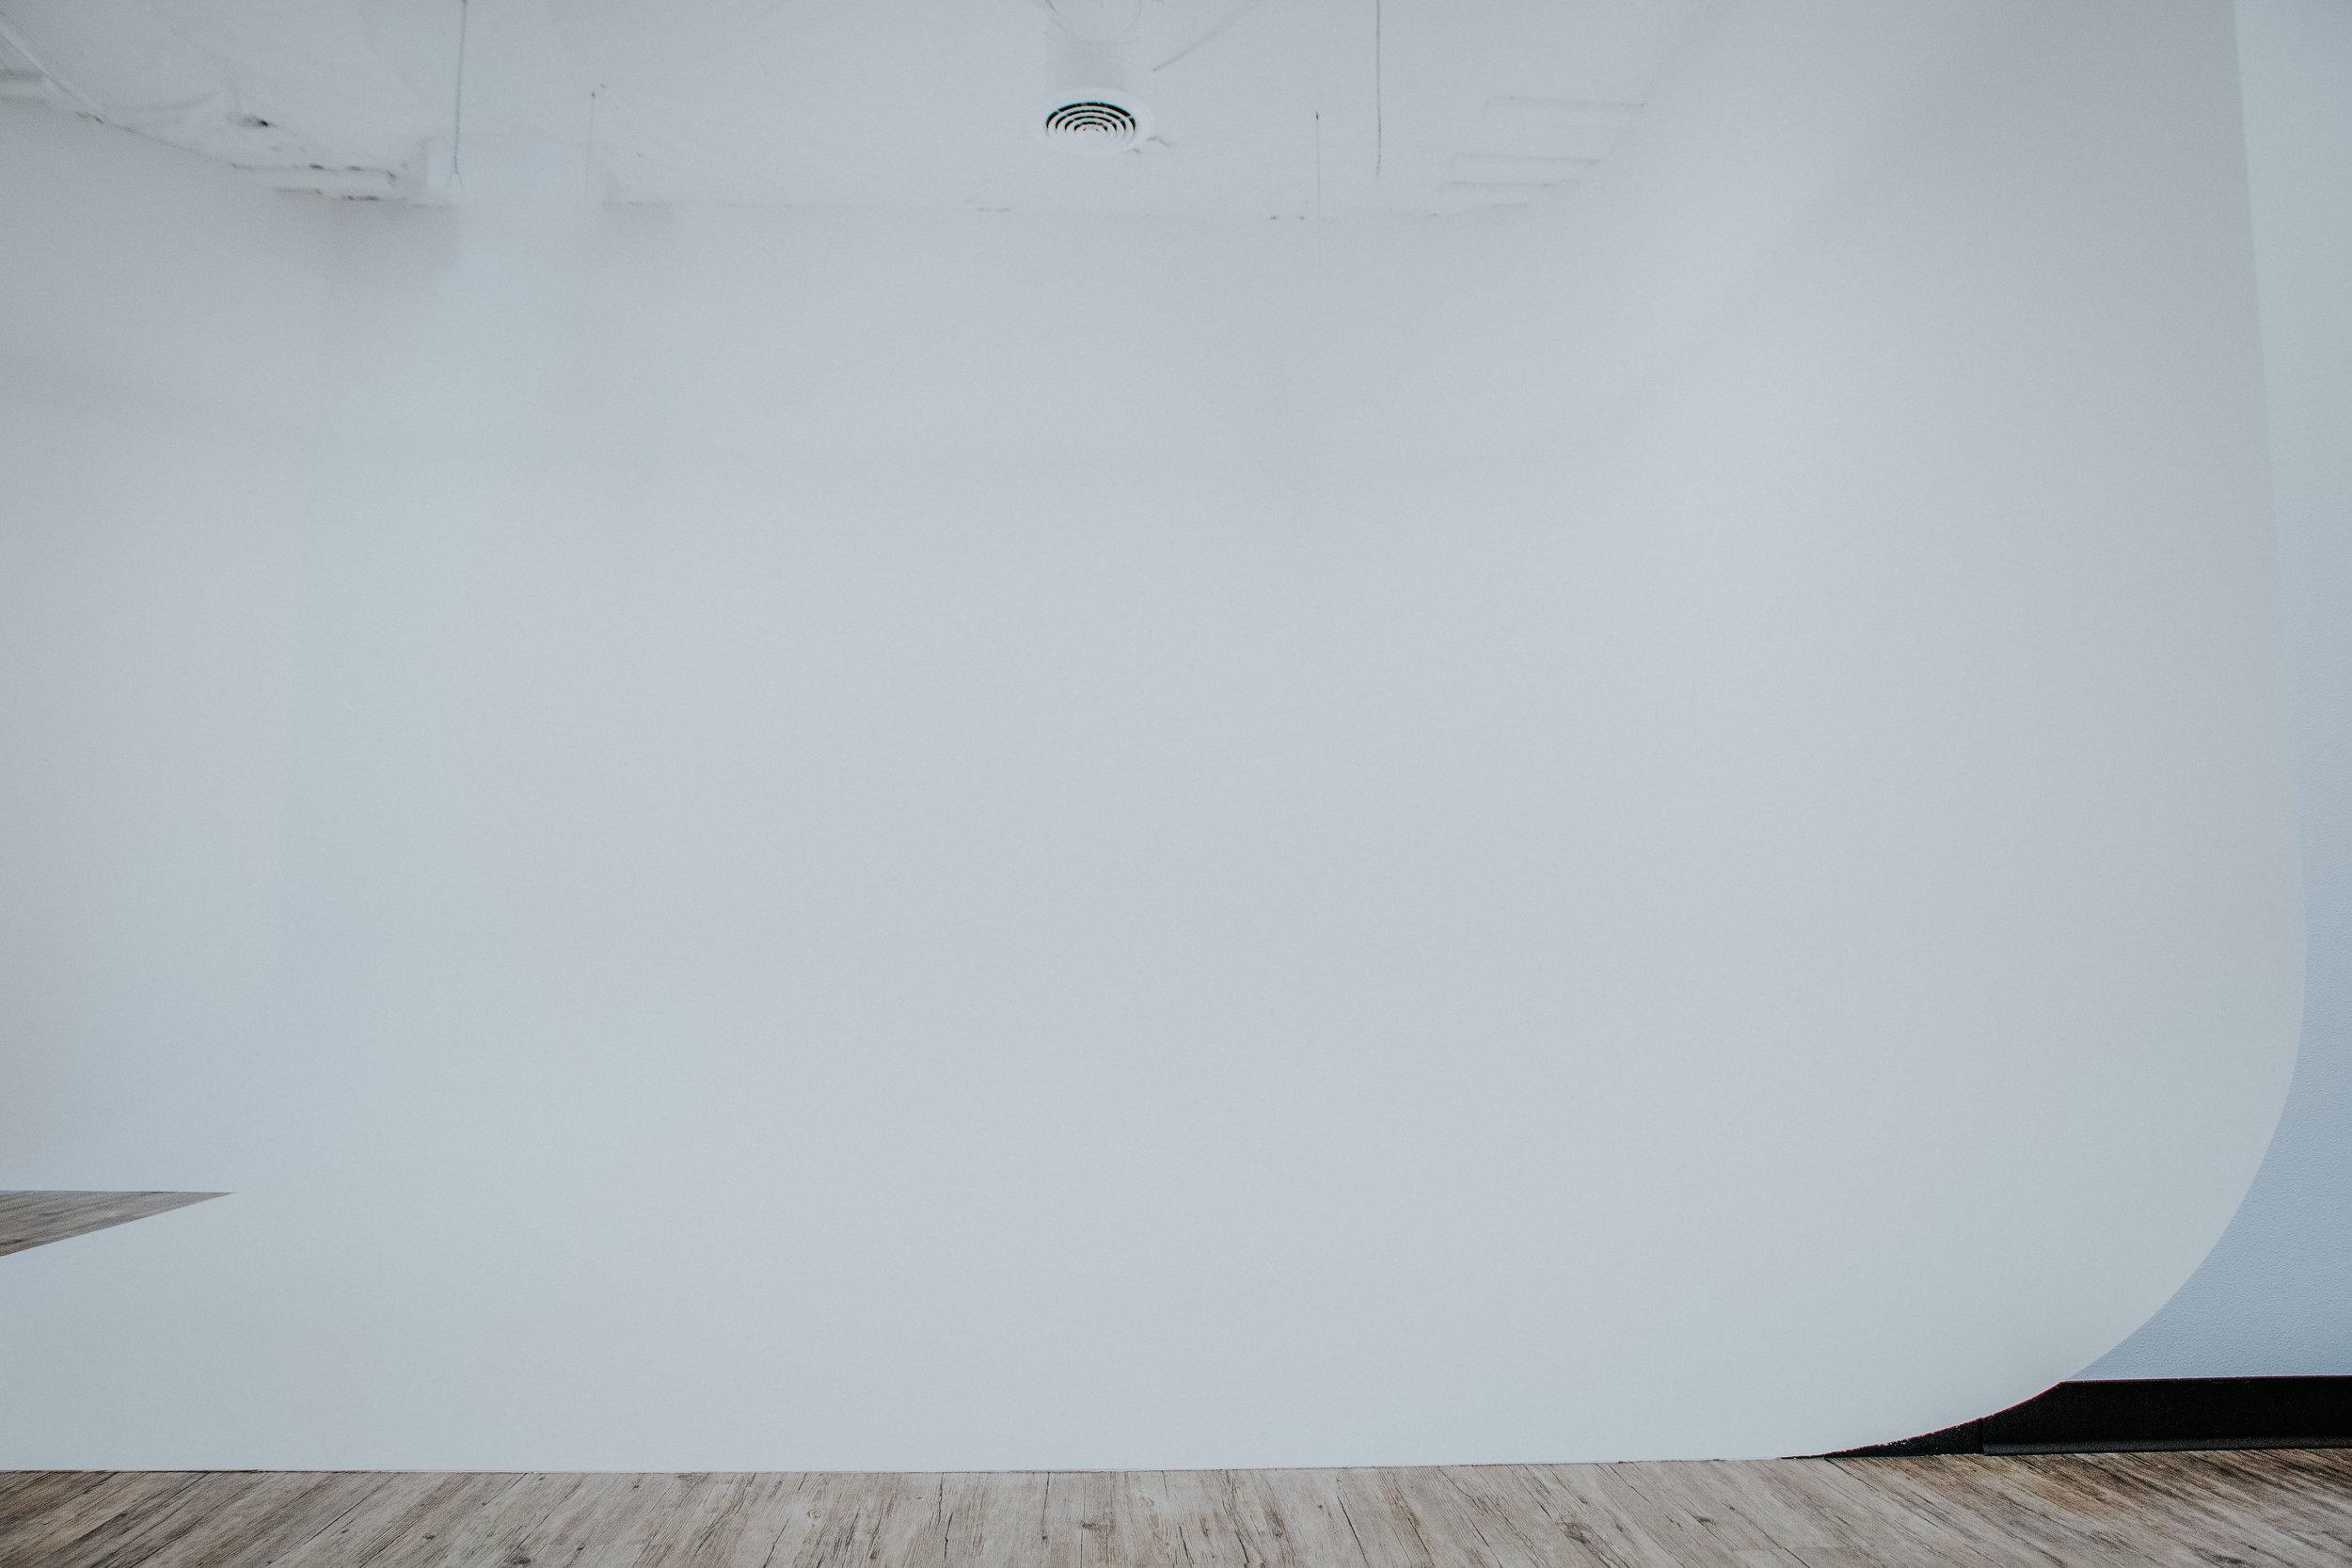 studio boise rental photography idaho-13.jpg